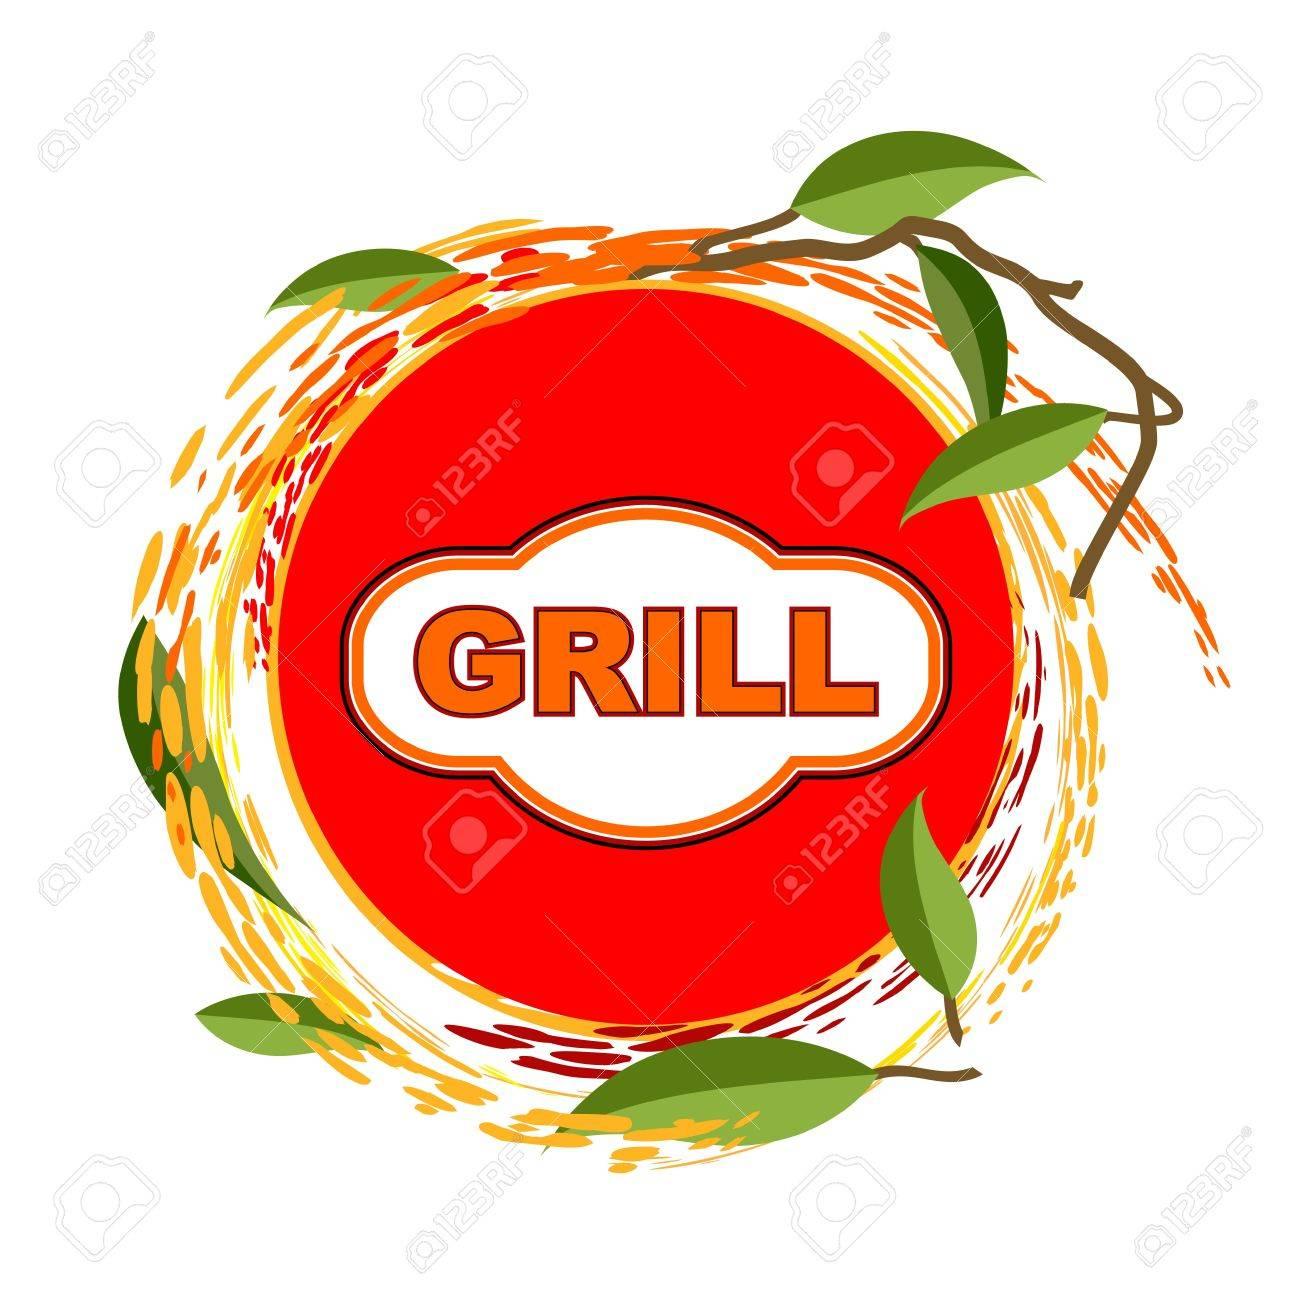 Grill sticker background design Stock Vector - 20978412